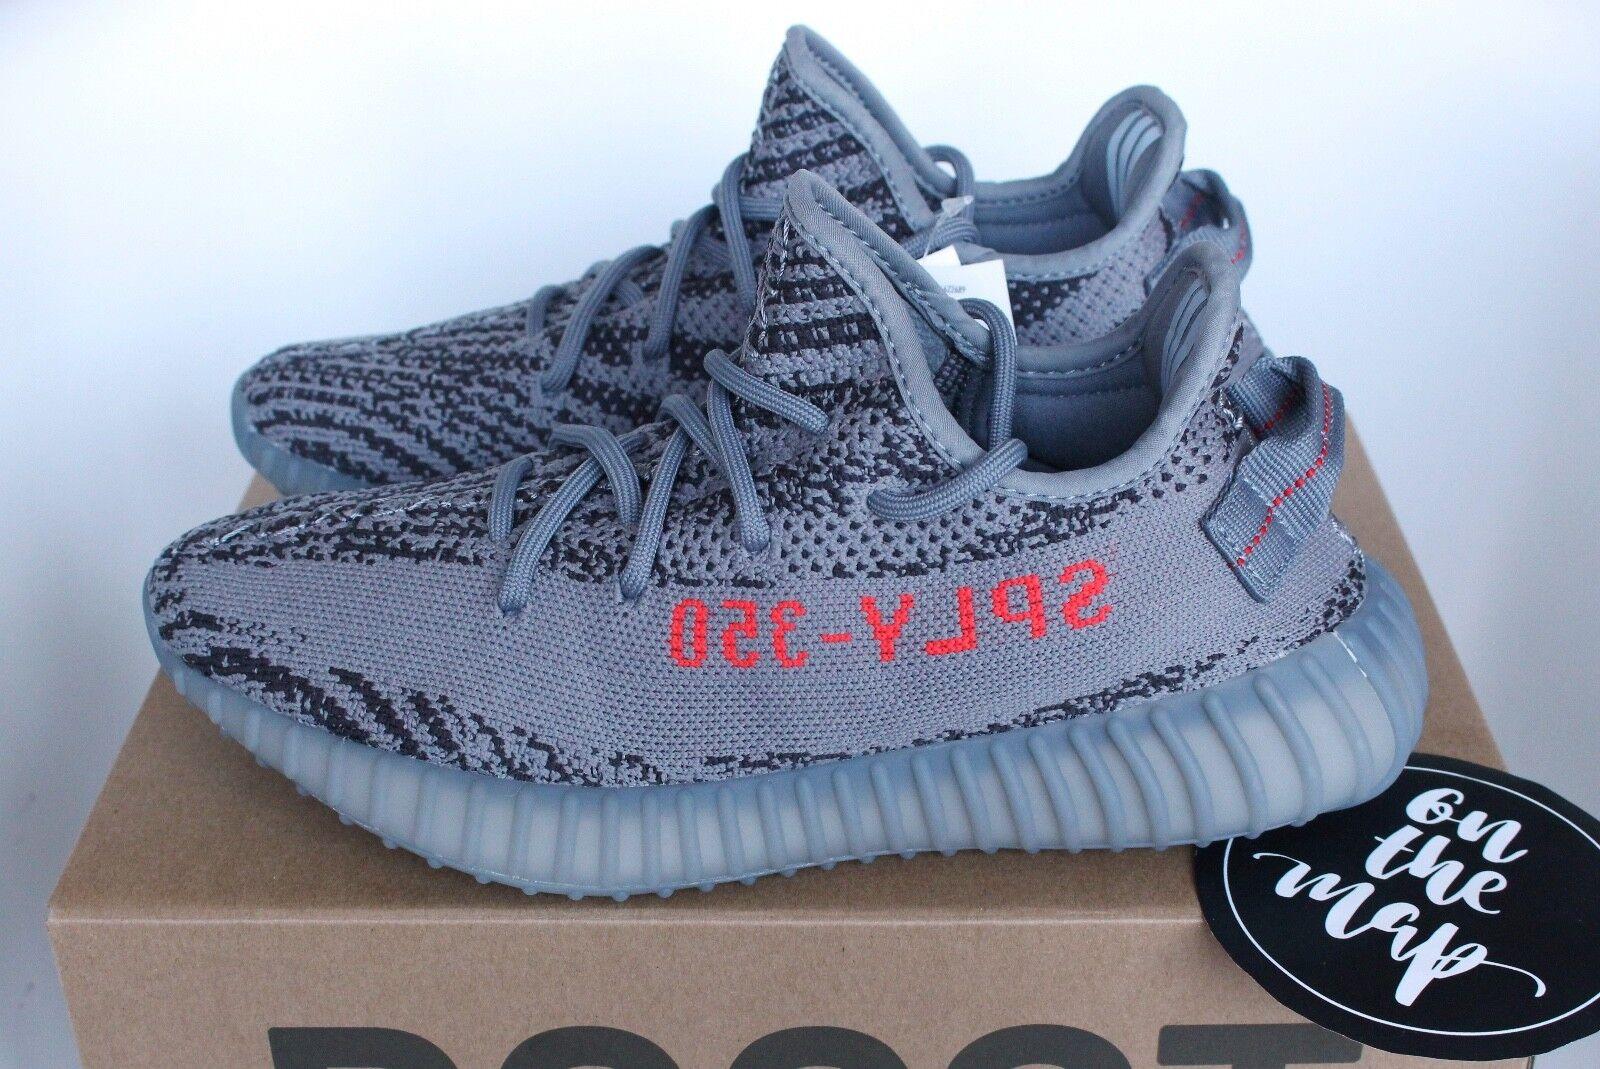 Adidas Yeezy Boost 350 V2 Beluga 2.0 gris naranja 6 ah2203 3 4 5 6 naranja 7 8 9 10 11 12 ddc287